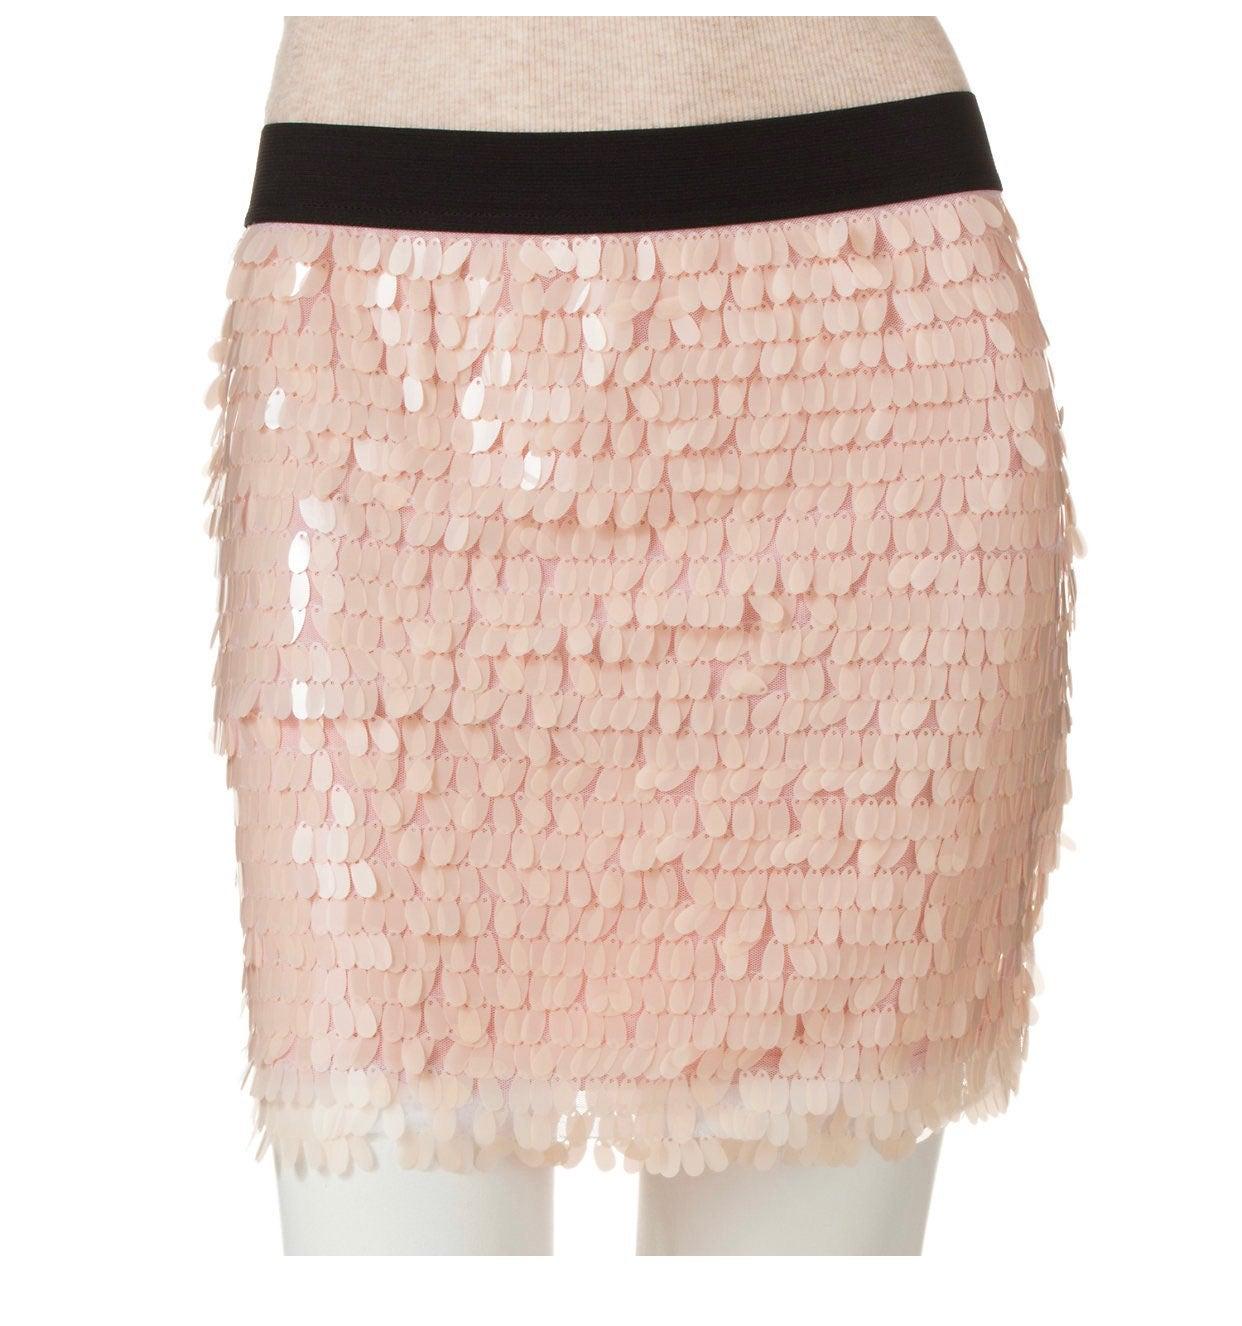 Candie's Sequin Body Con Skirt